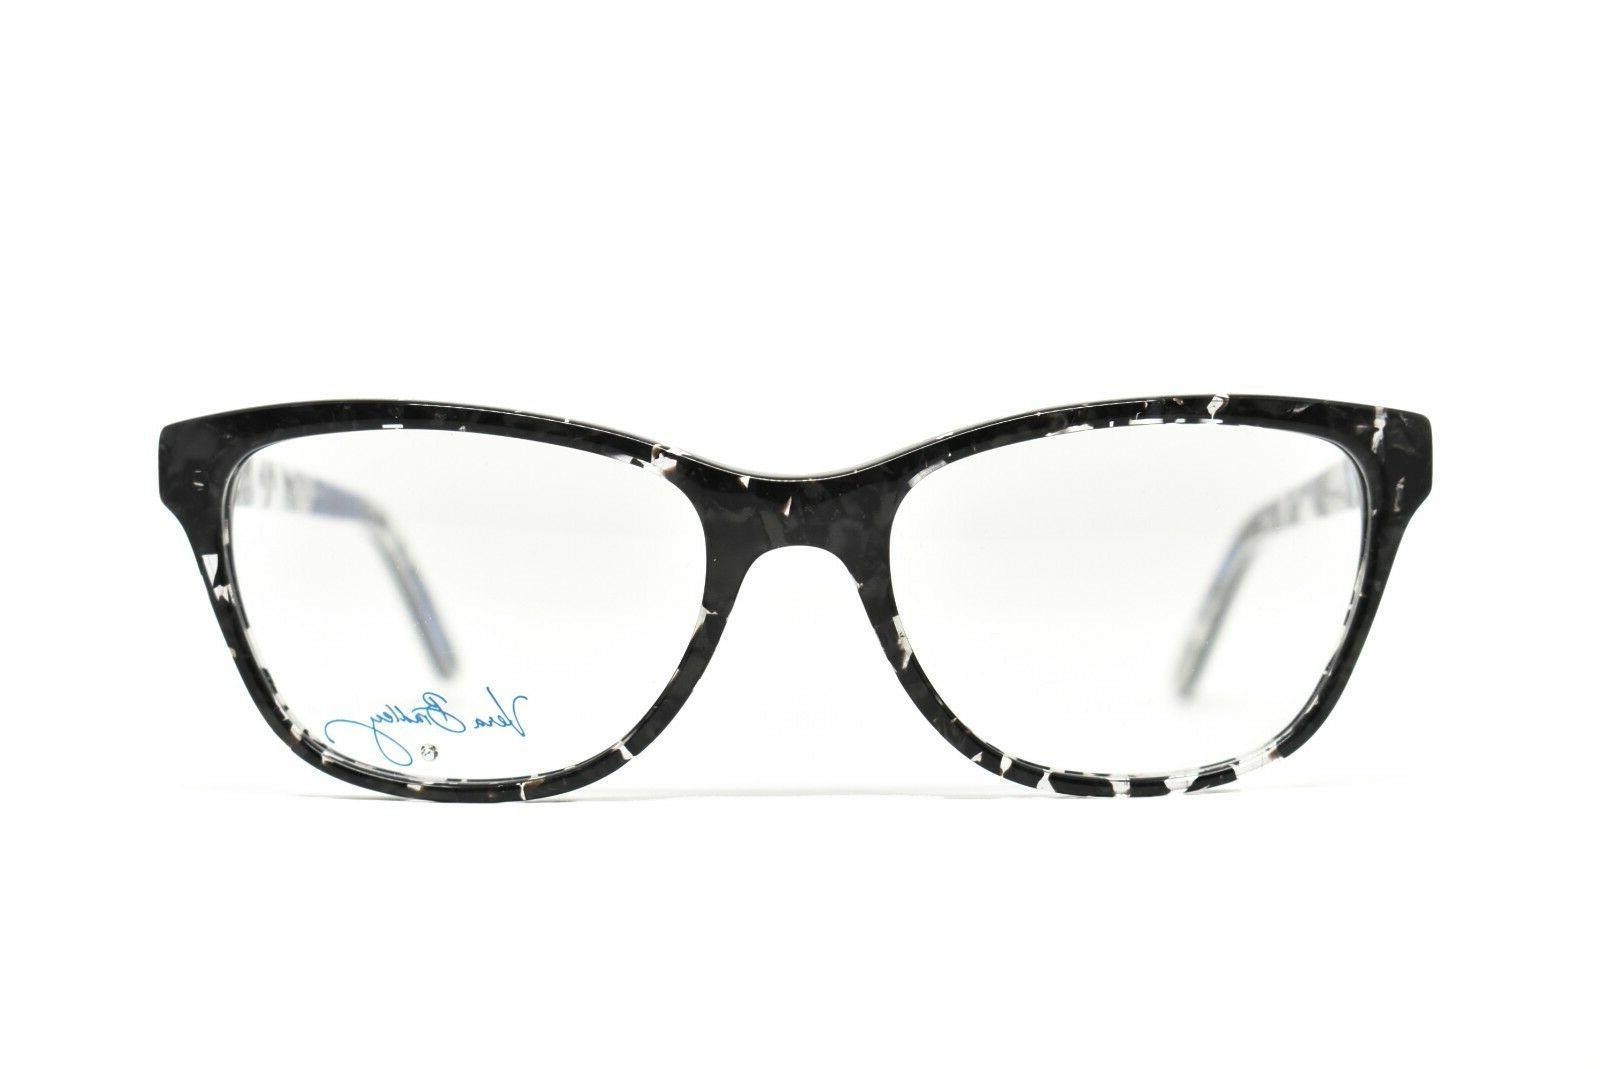 New Vera Eyeglasses Blue 53-17-137 without